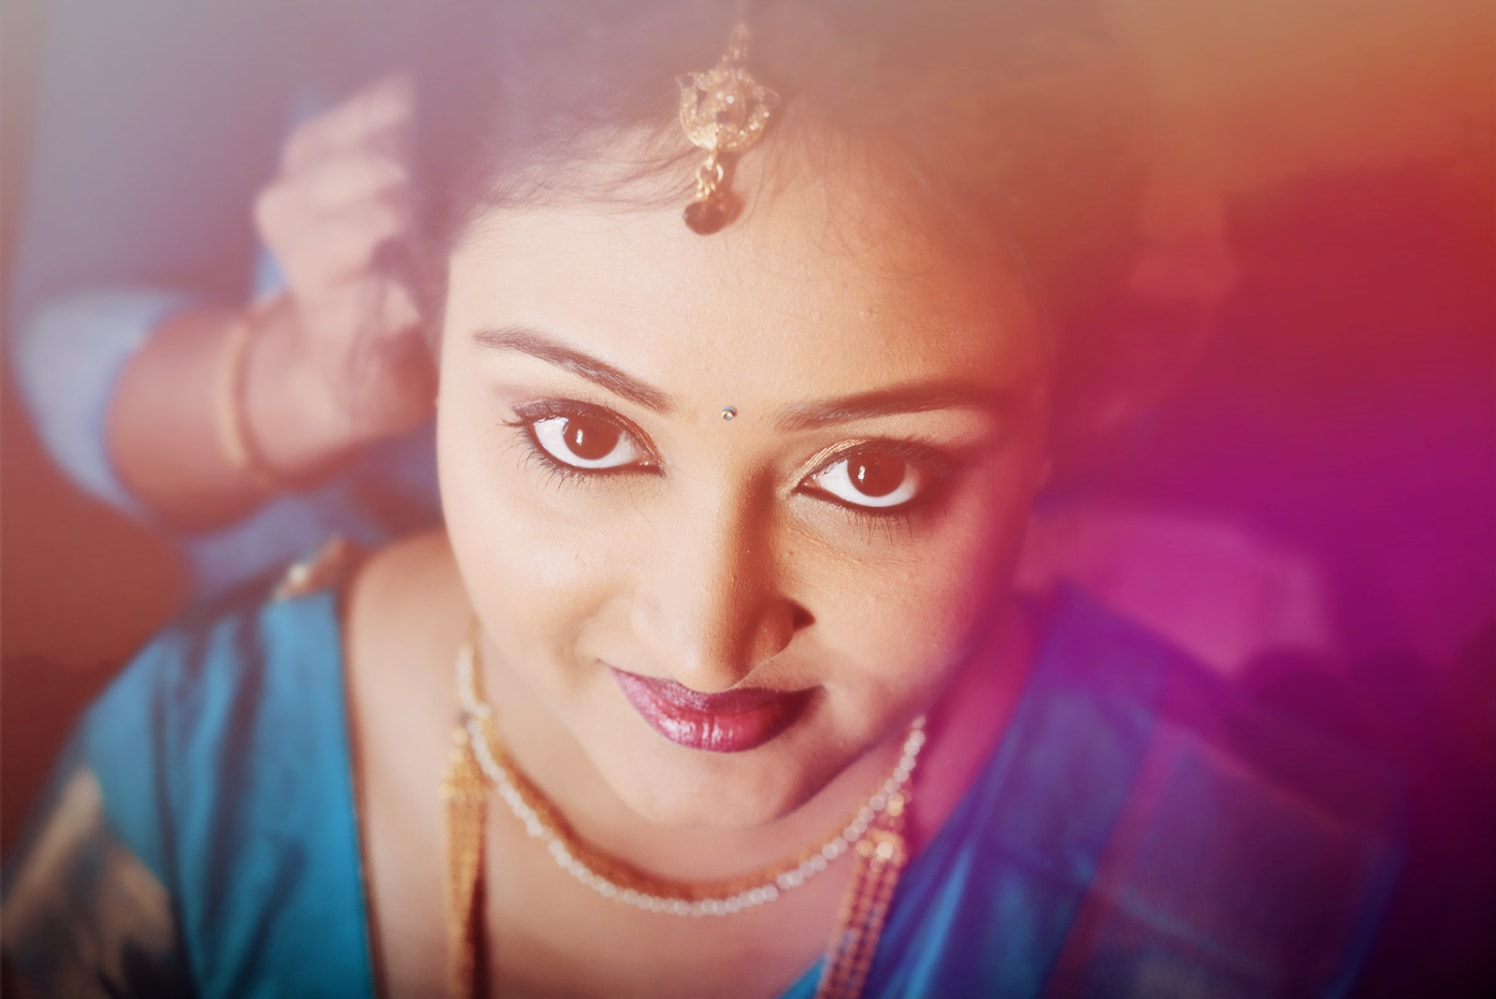 Bride Wearing Light and Natural Makeup by Priyanka Bridal-makeup   Weddings Photos & Ideas